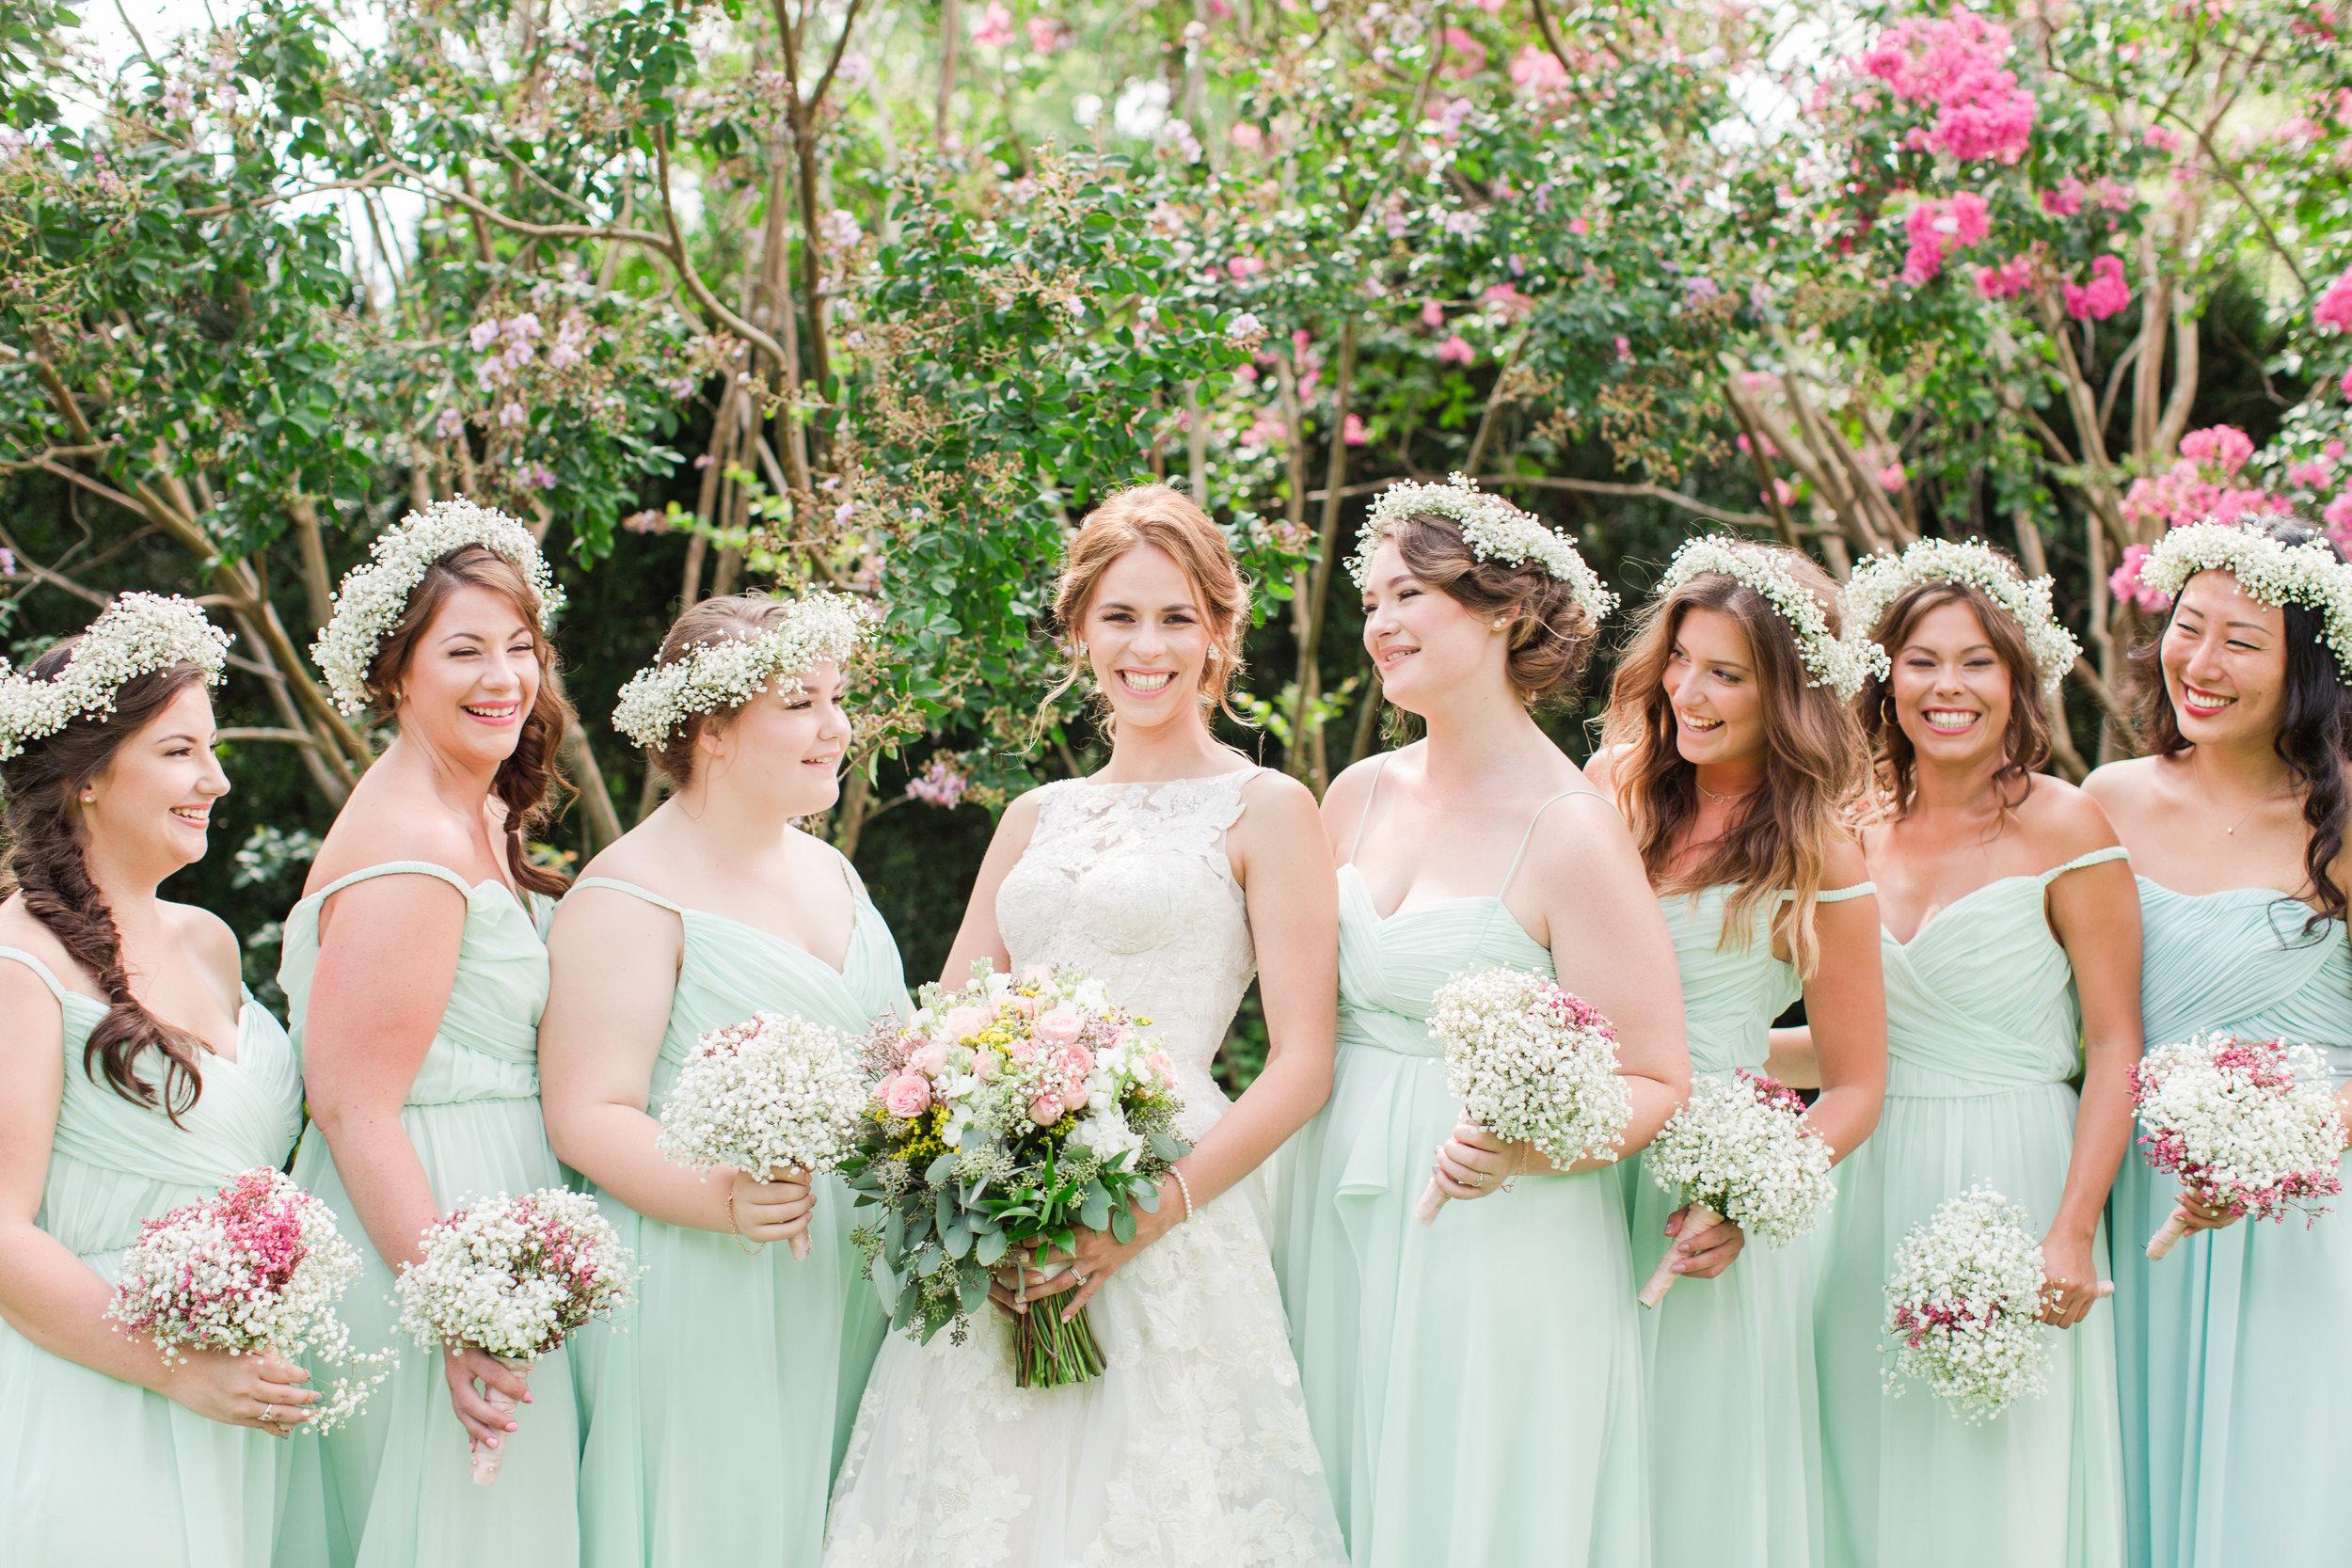 White Bridesmaid Flower Crowns - West Virginia Wedding Photographer - Wedding Venue